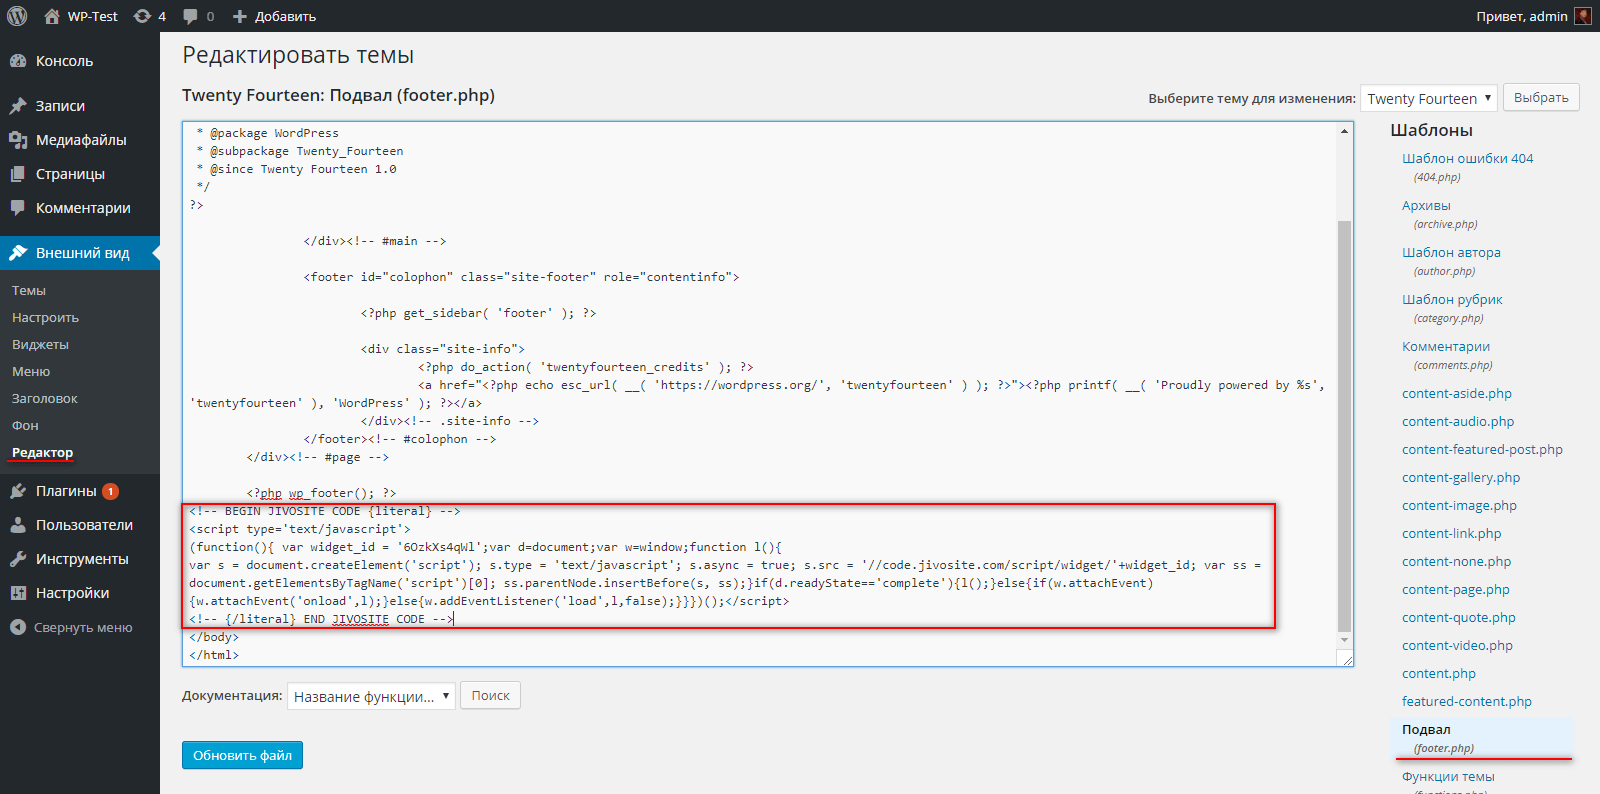 Добавляем код онлайн чата JivoSite